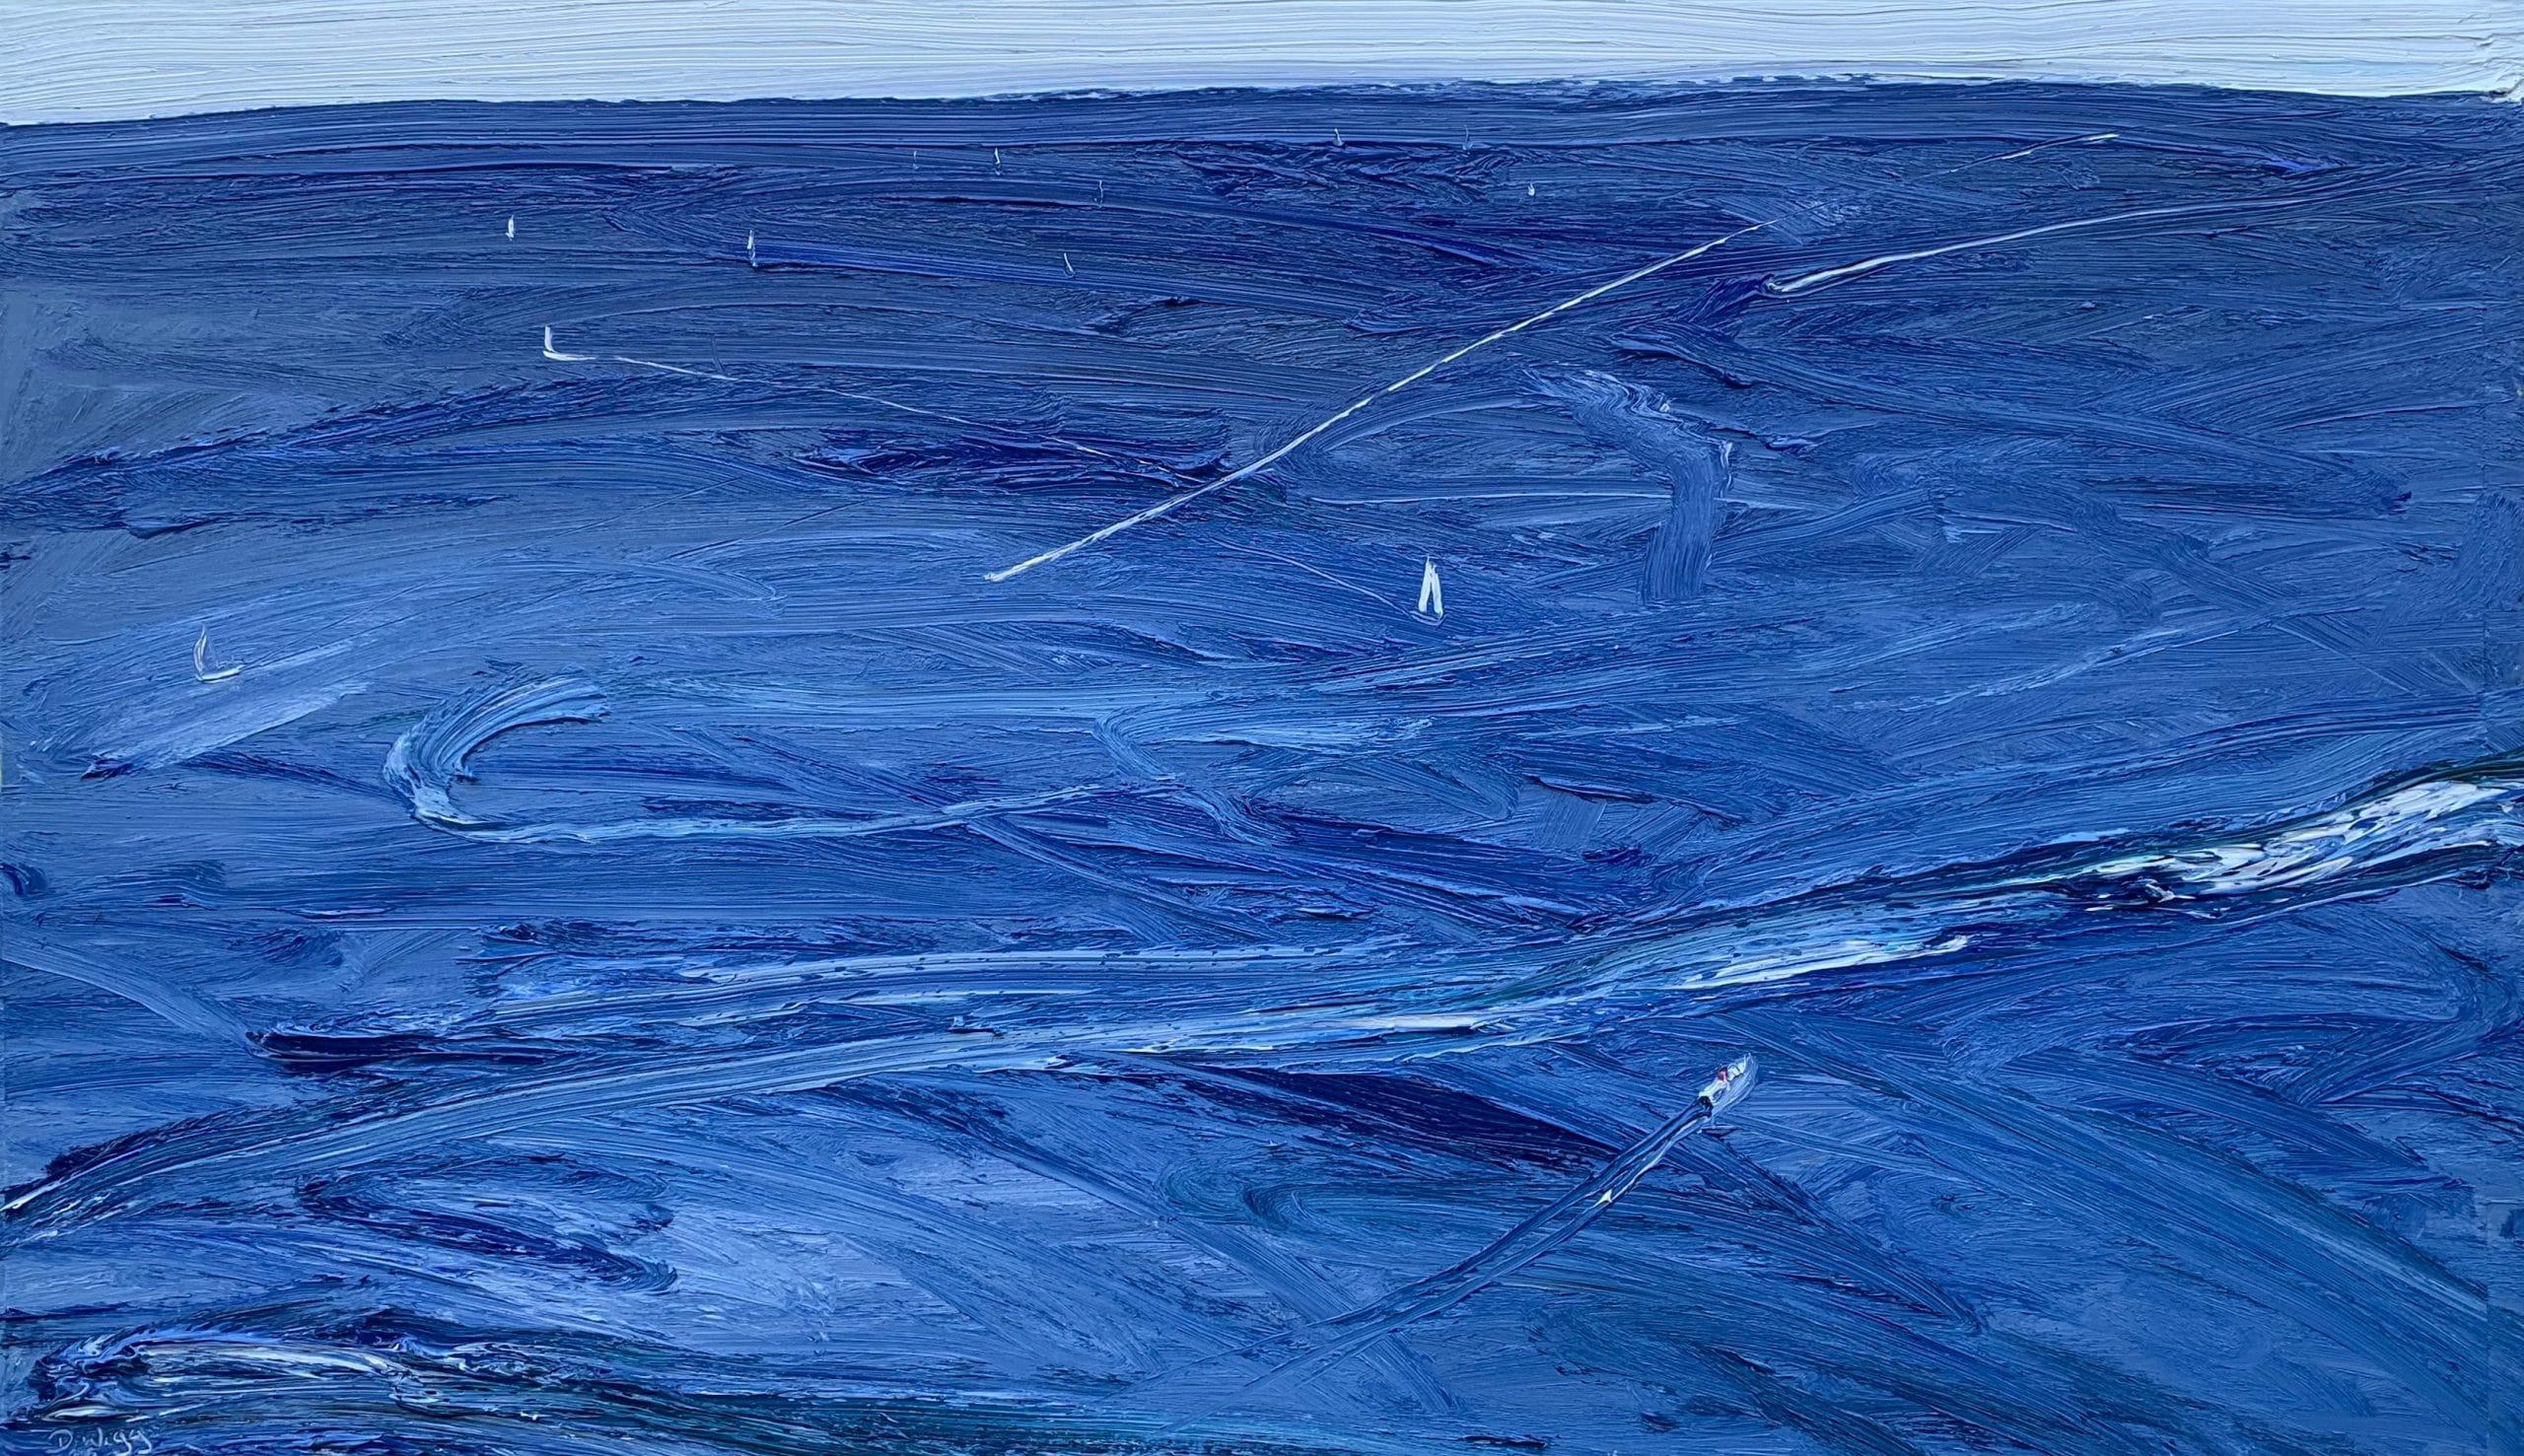 South Easterly Between The Heads-Aquatic Memory-Plein air-Oil on oil paper-79cm x 132cm unframed 100cm x 150cm framed-David K Wiggs 2020